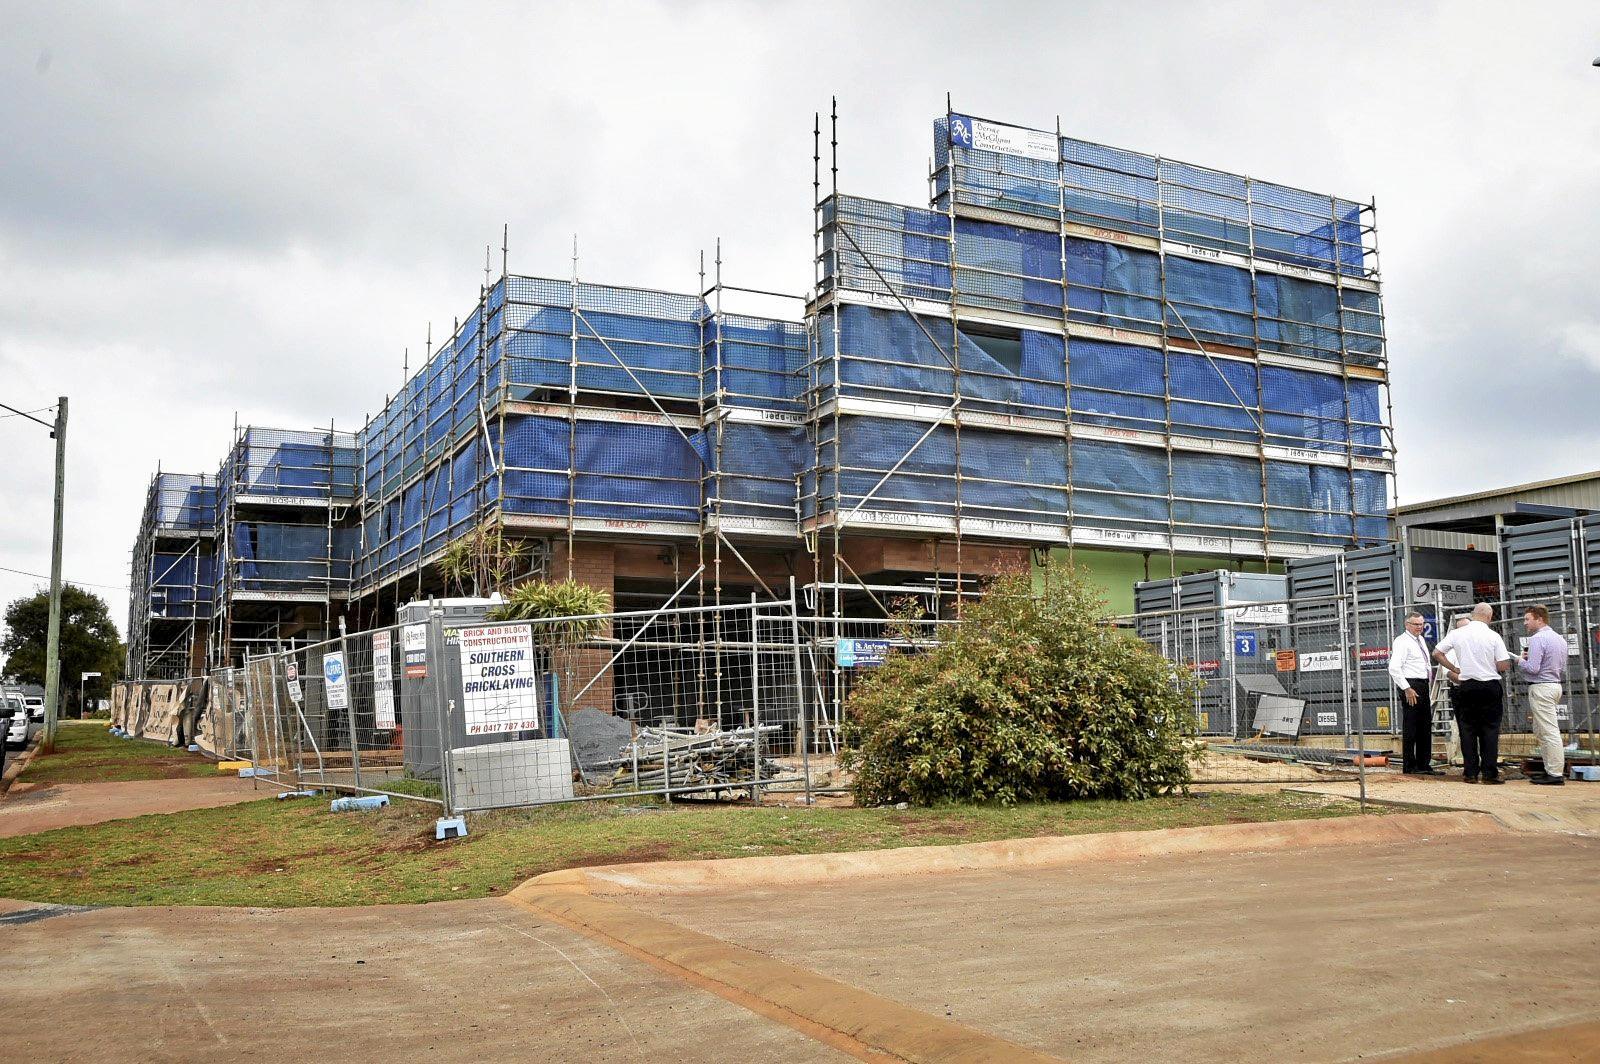 St Andrew's Hospital progress on building of new mental health ward. October 2018